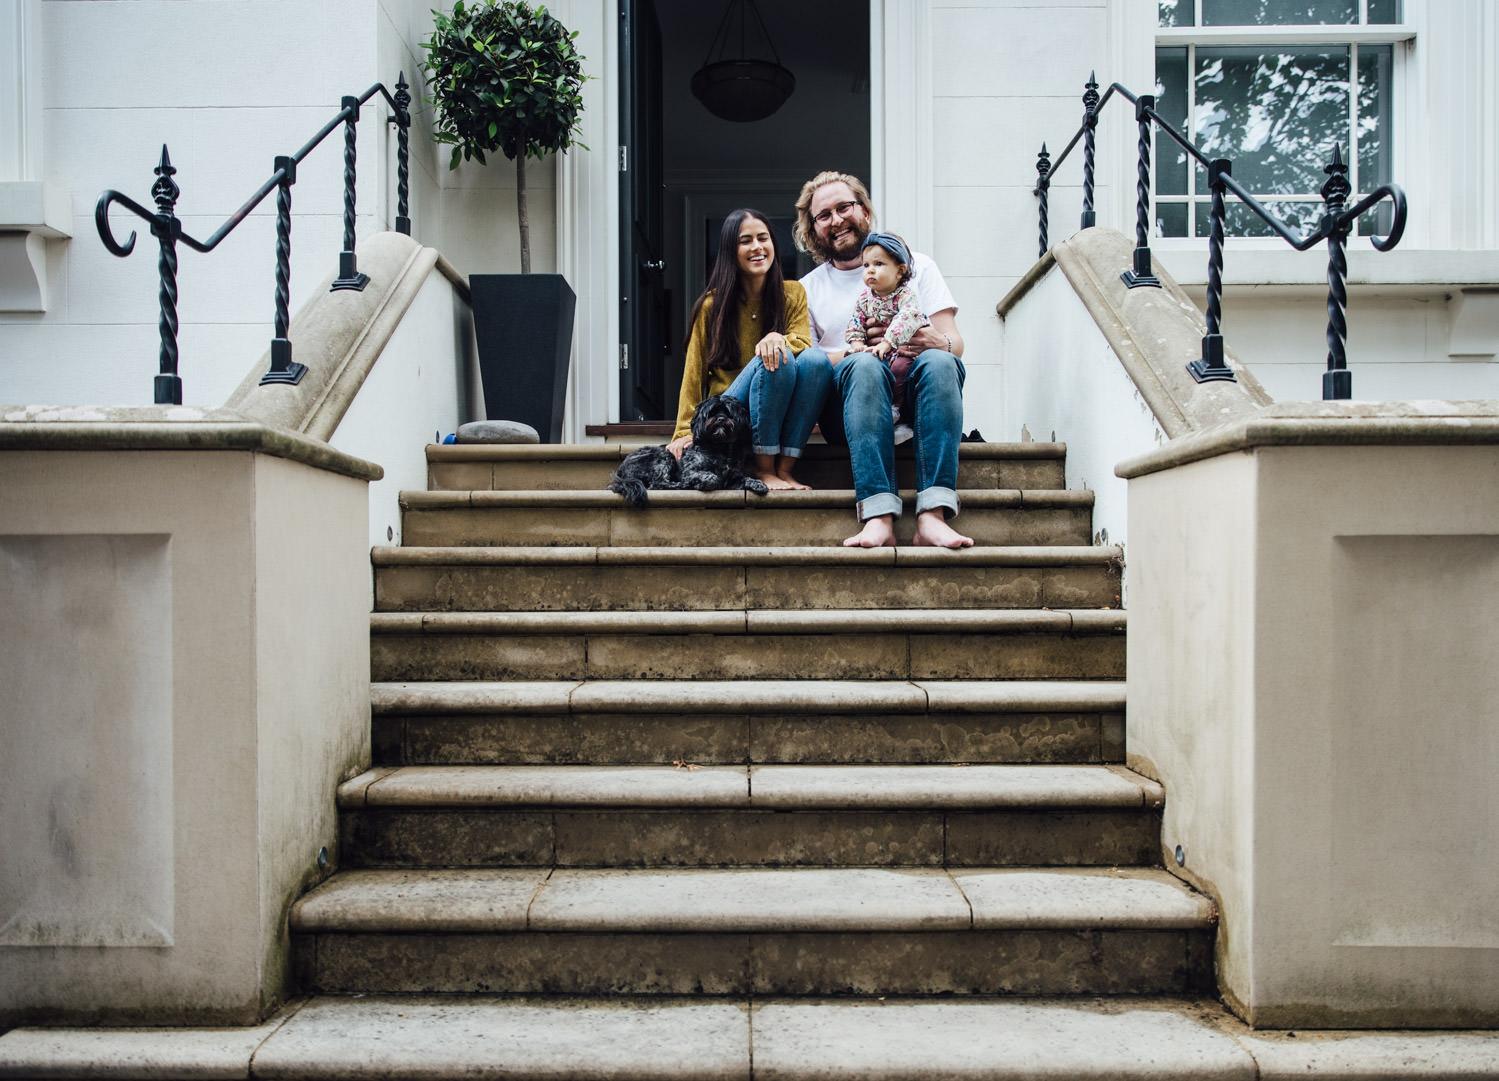 St John's Wood family photography | Doorstep portrait shoot in NW8